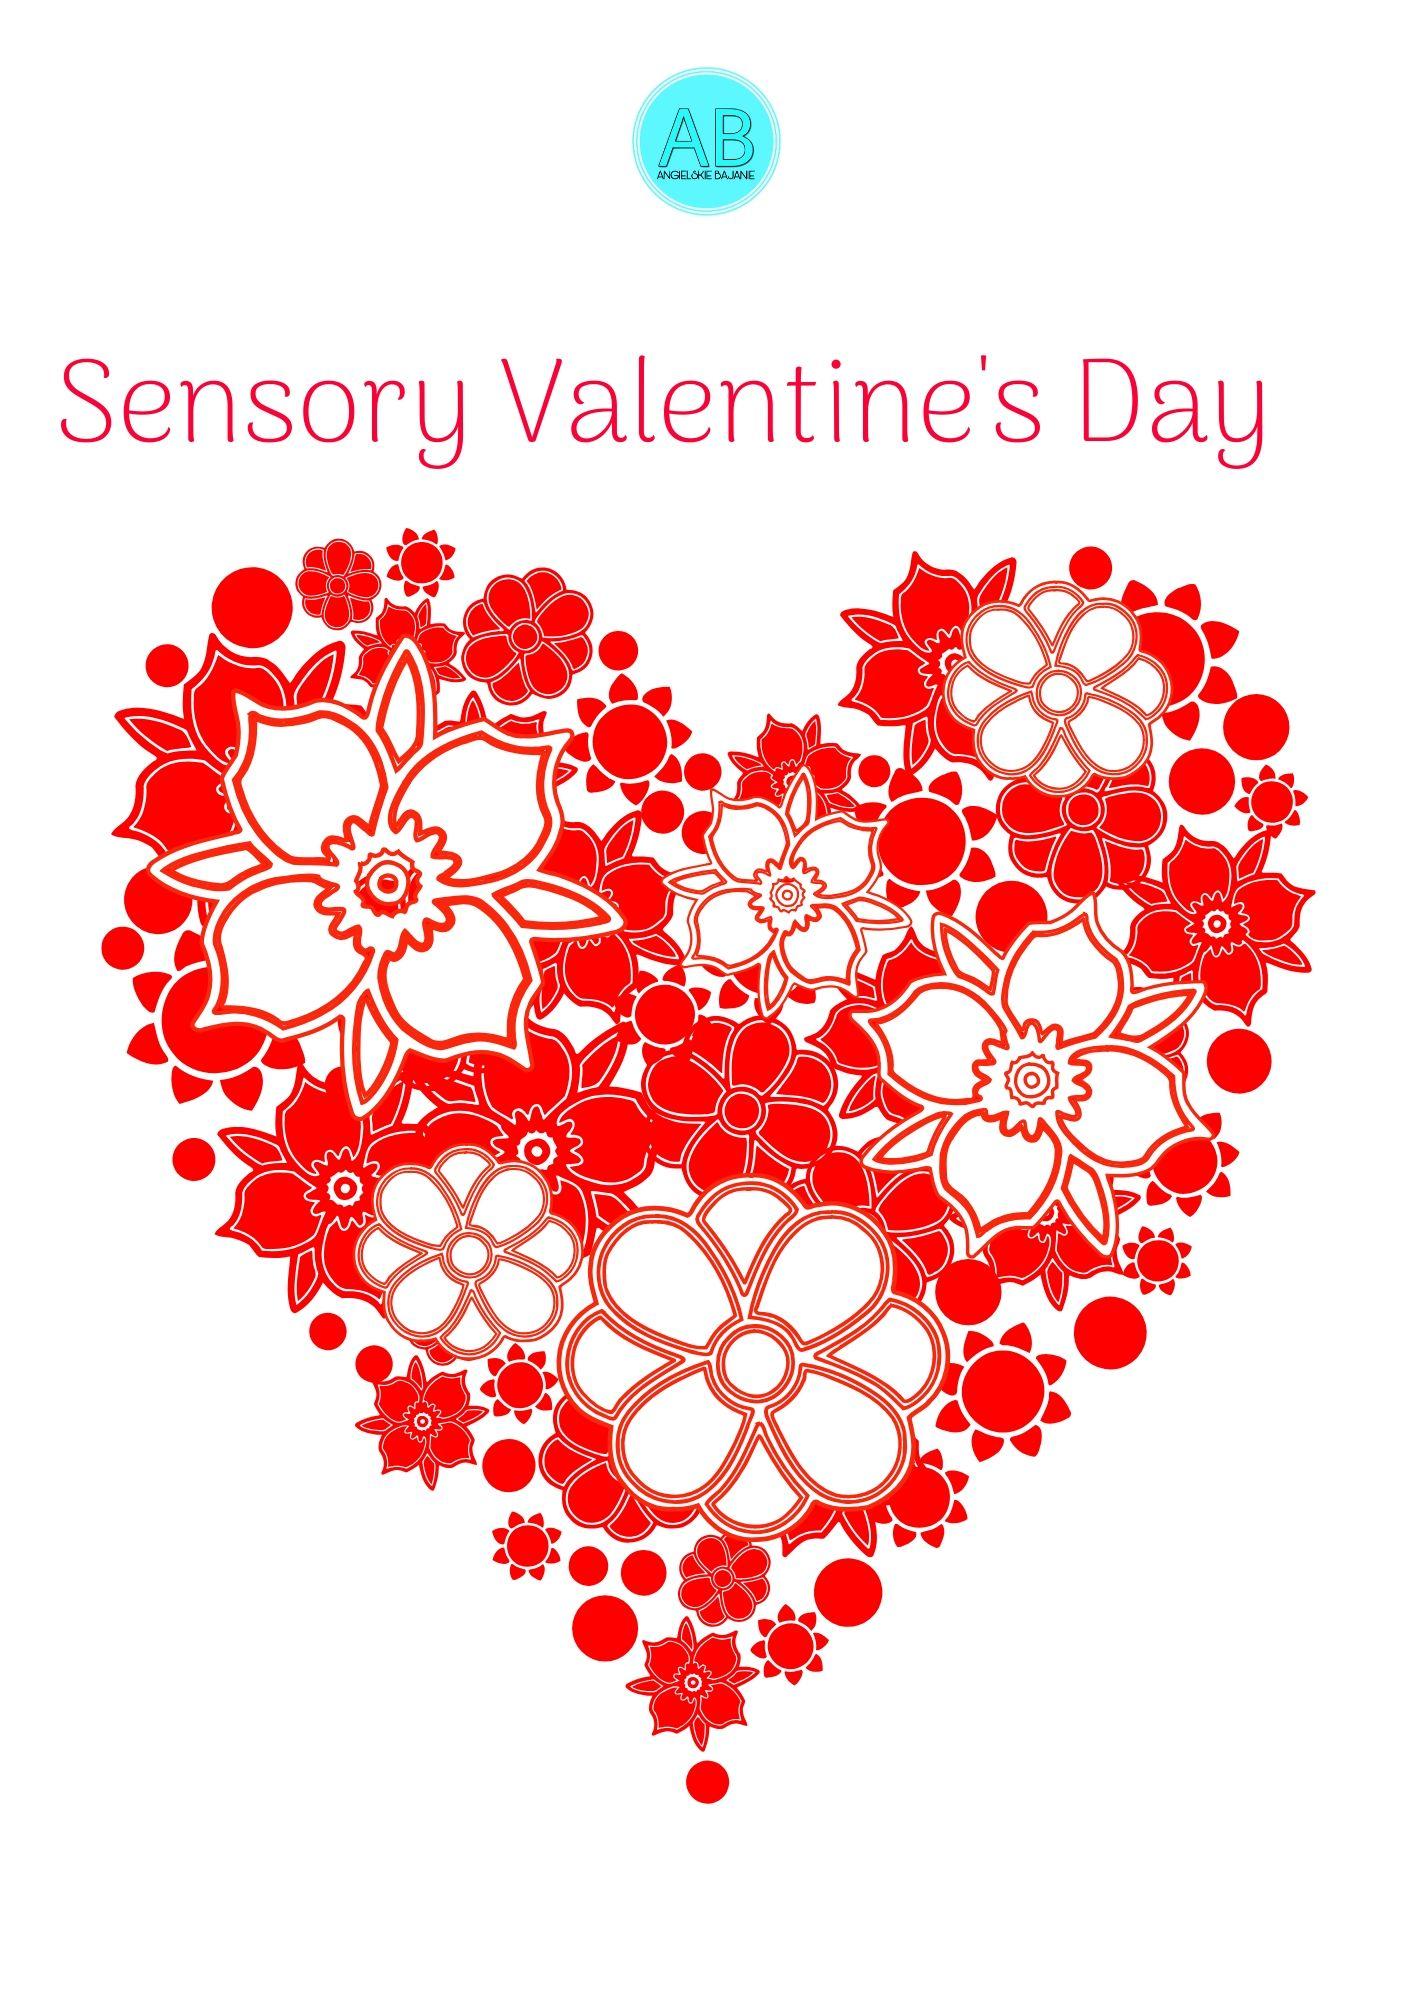 Valentine's Day Sensory Hearts